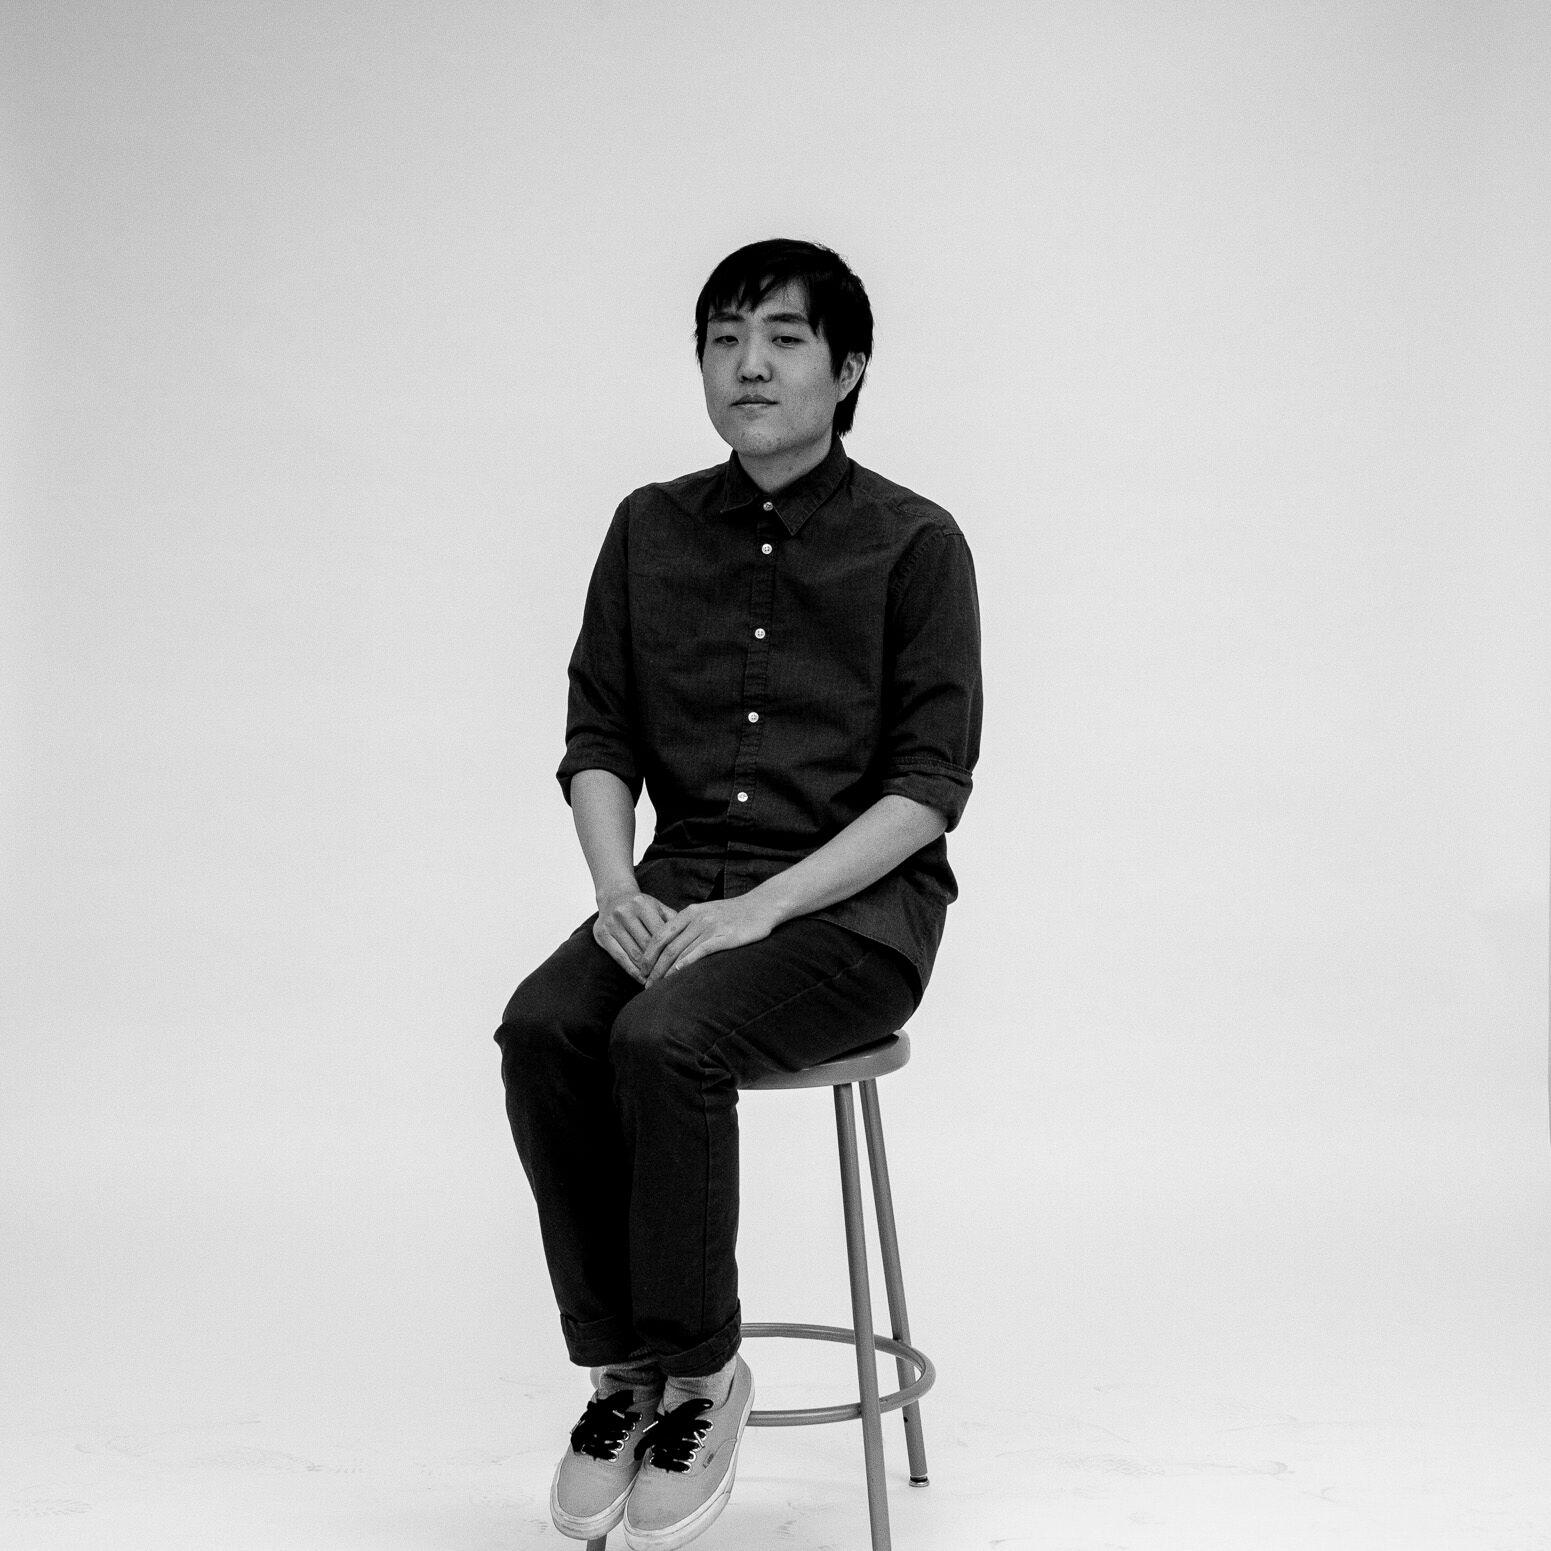 Phillip Han